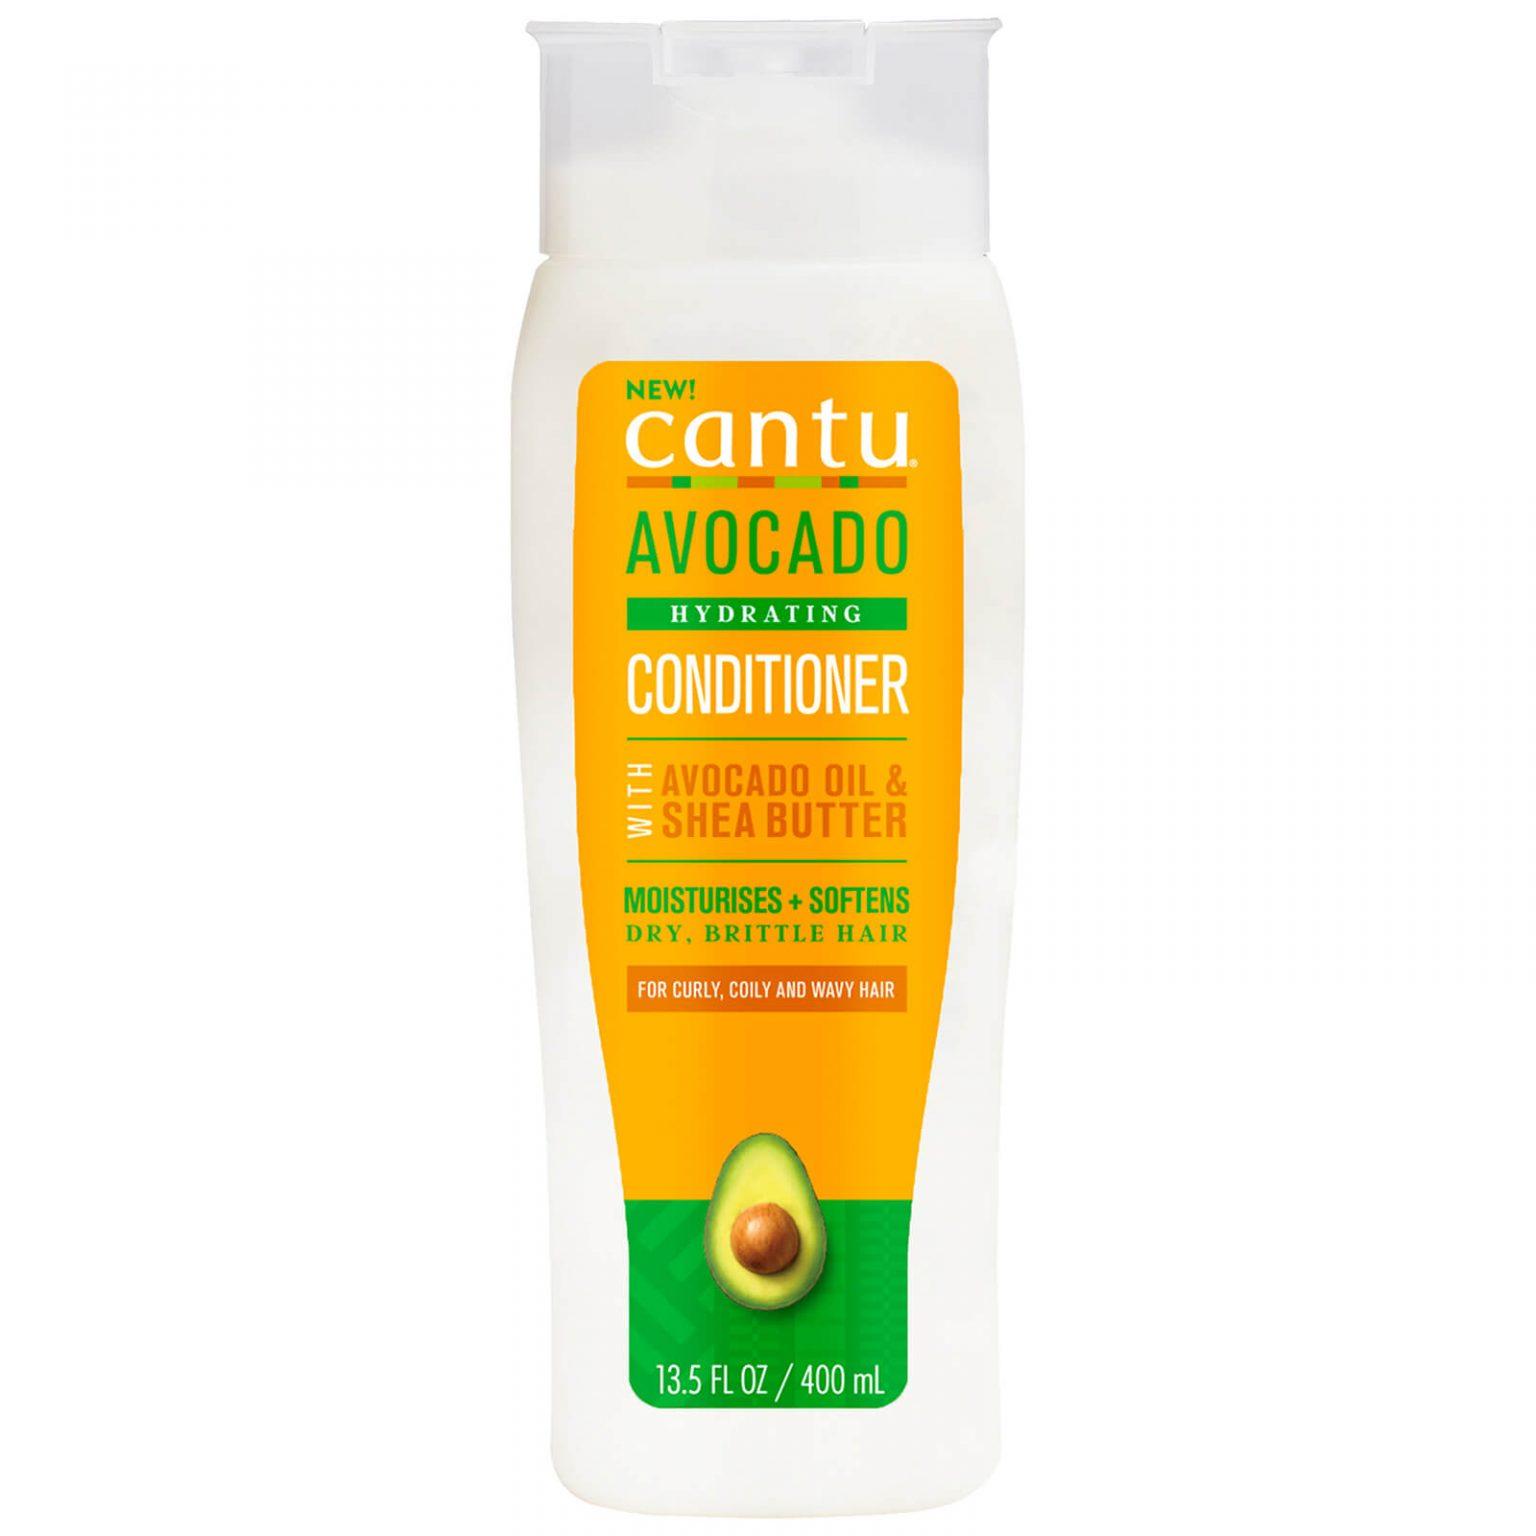 Cantu_avocado_conditioner